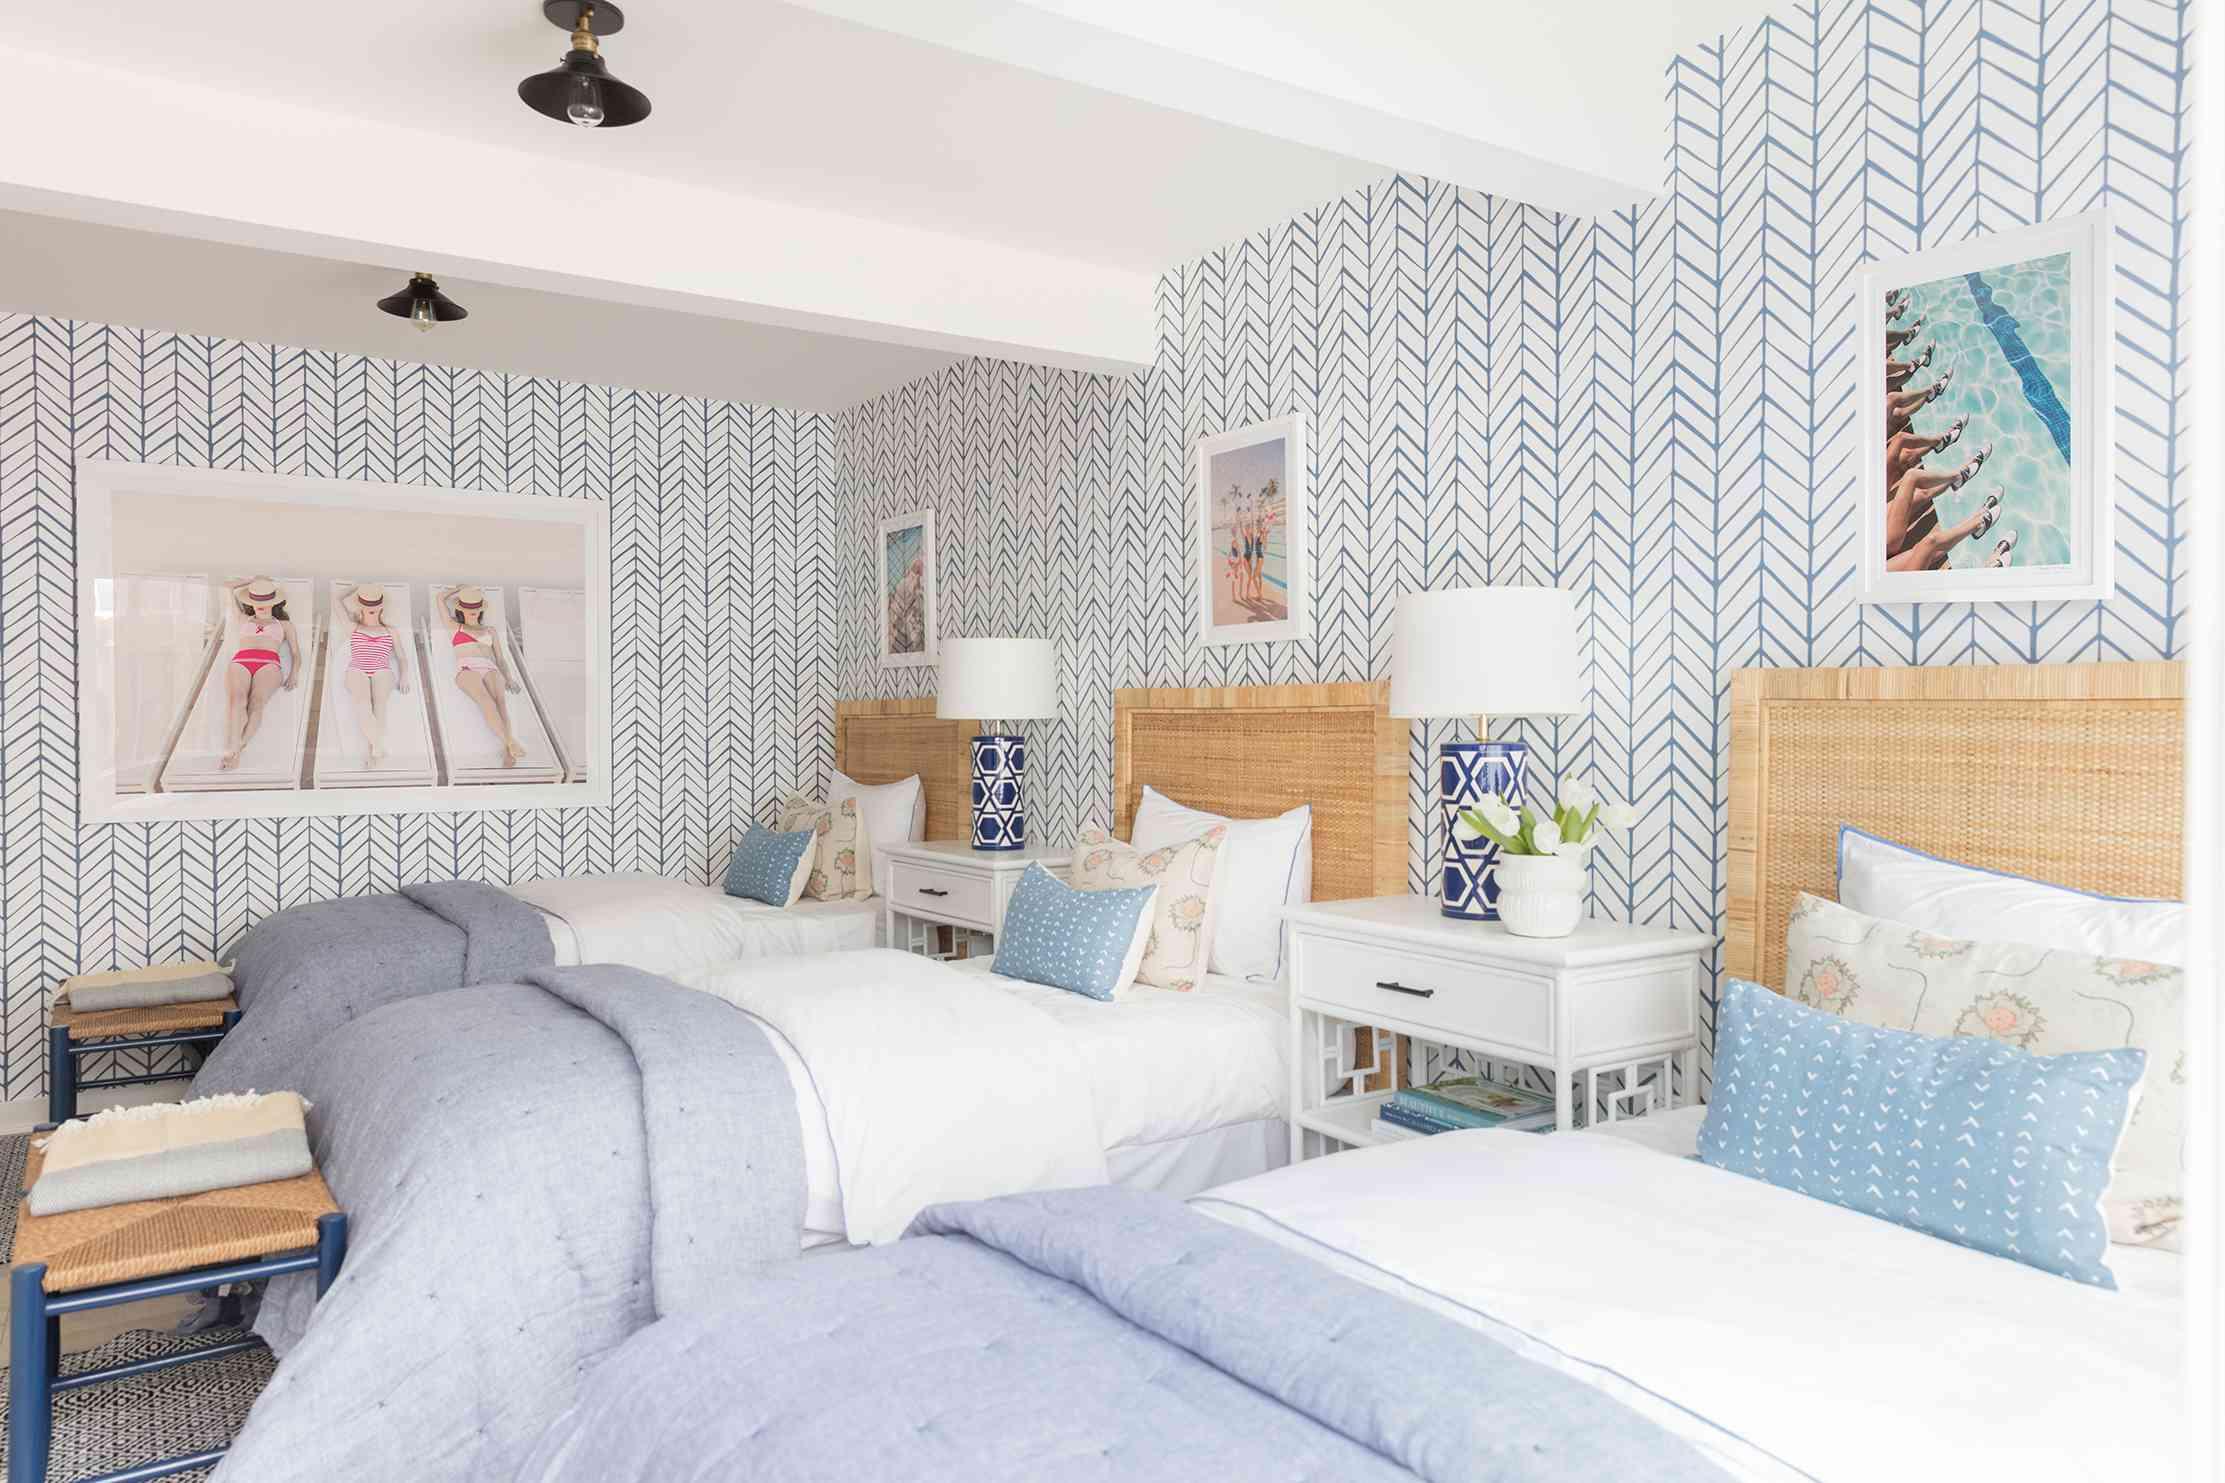 makeover of the week - kate lester guest bedroom